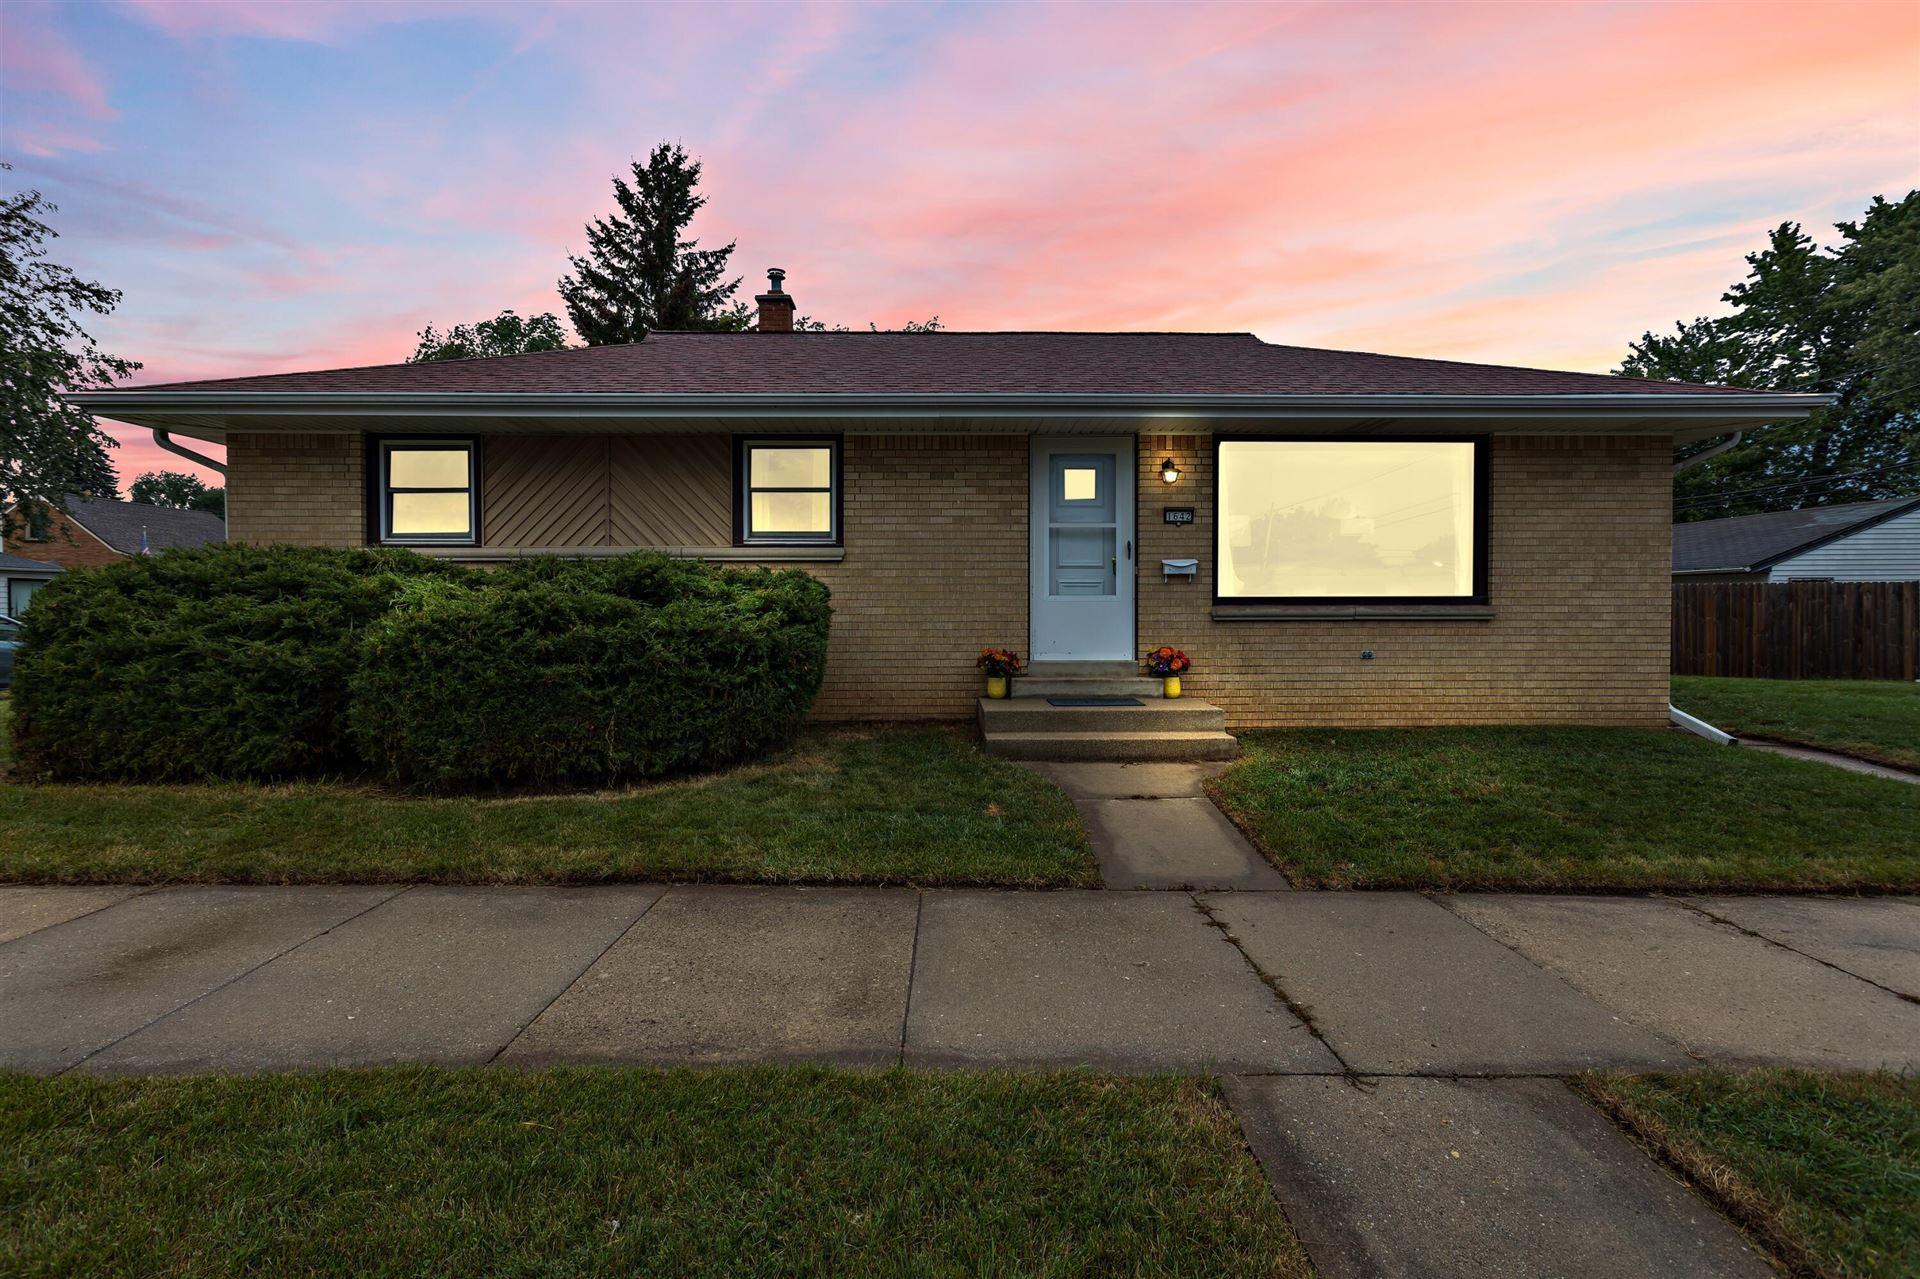 1642 Minnesota AVE, South Milwaukee, WI 53172 - MLS#: 1762371